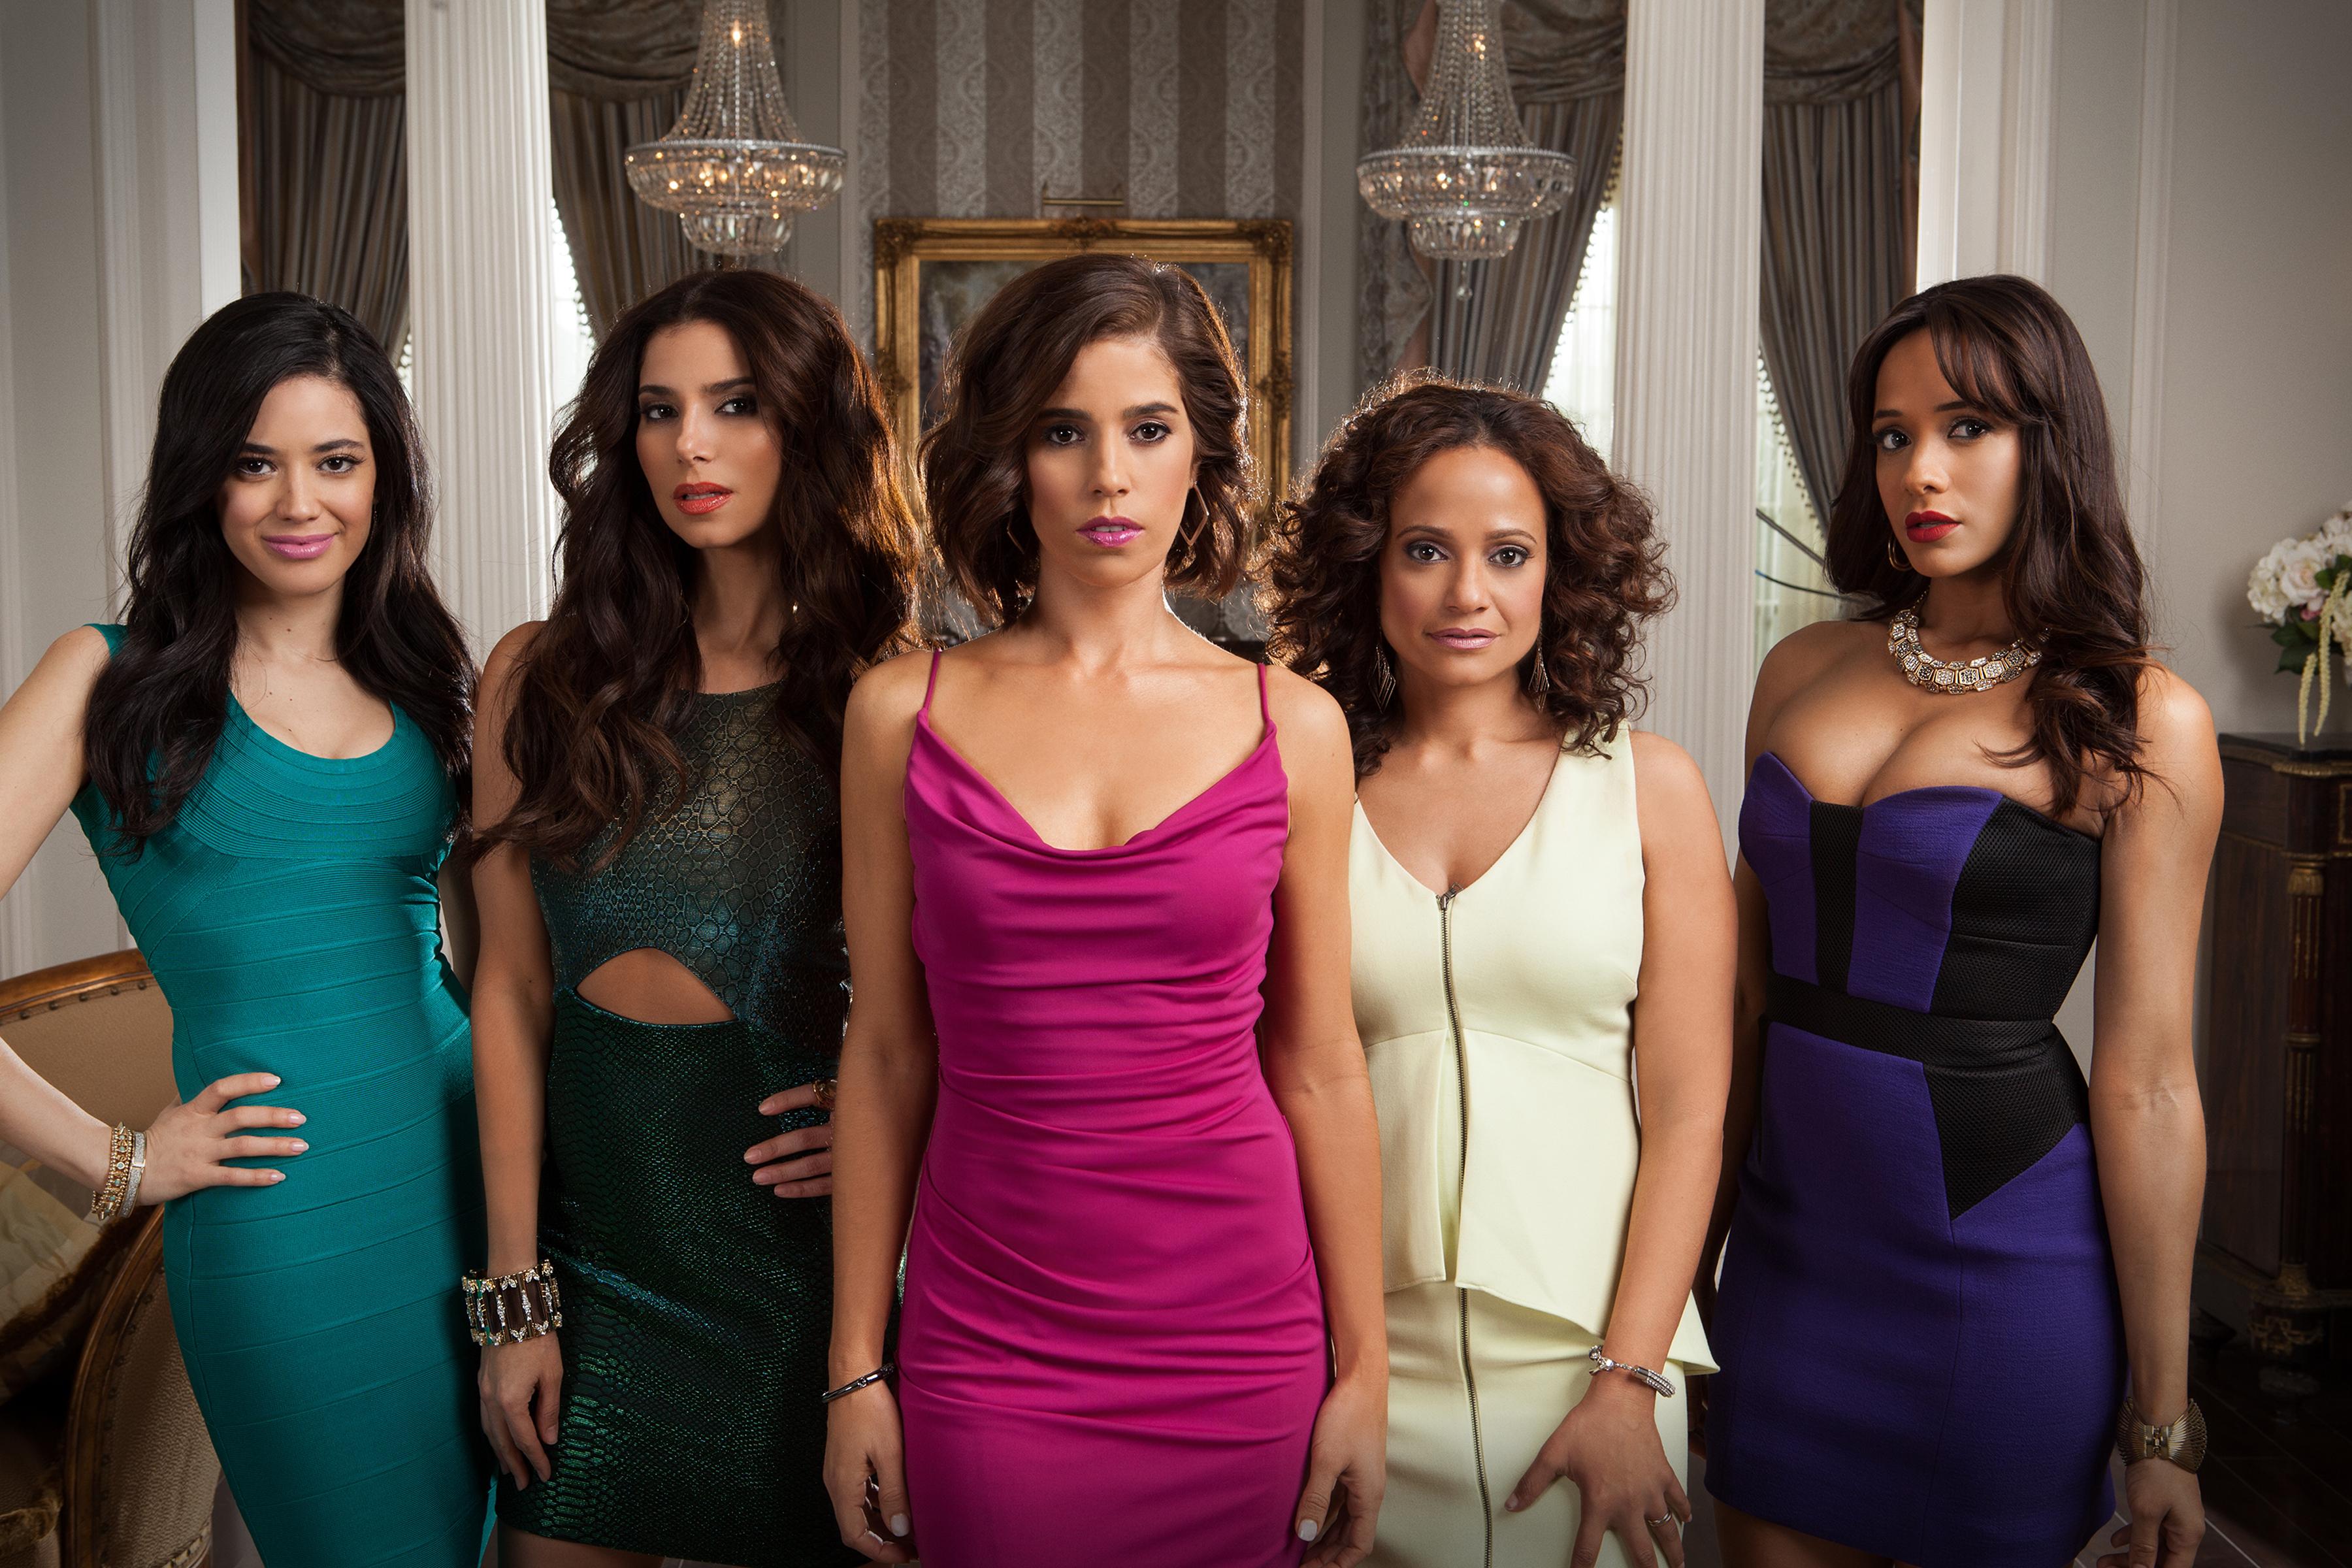 'Devious Maids' stars share their beauty secrets